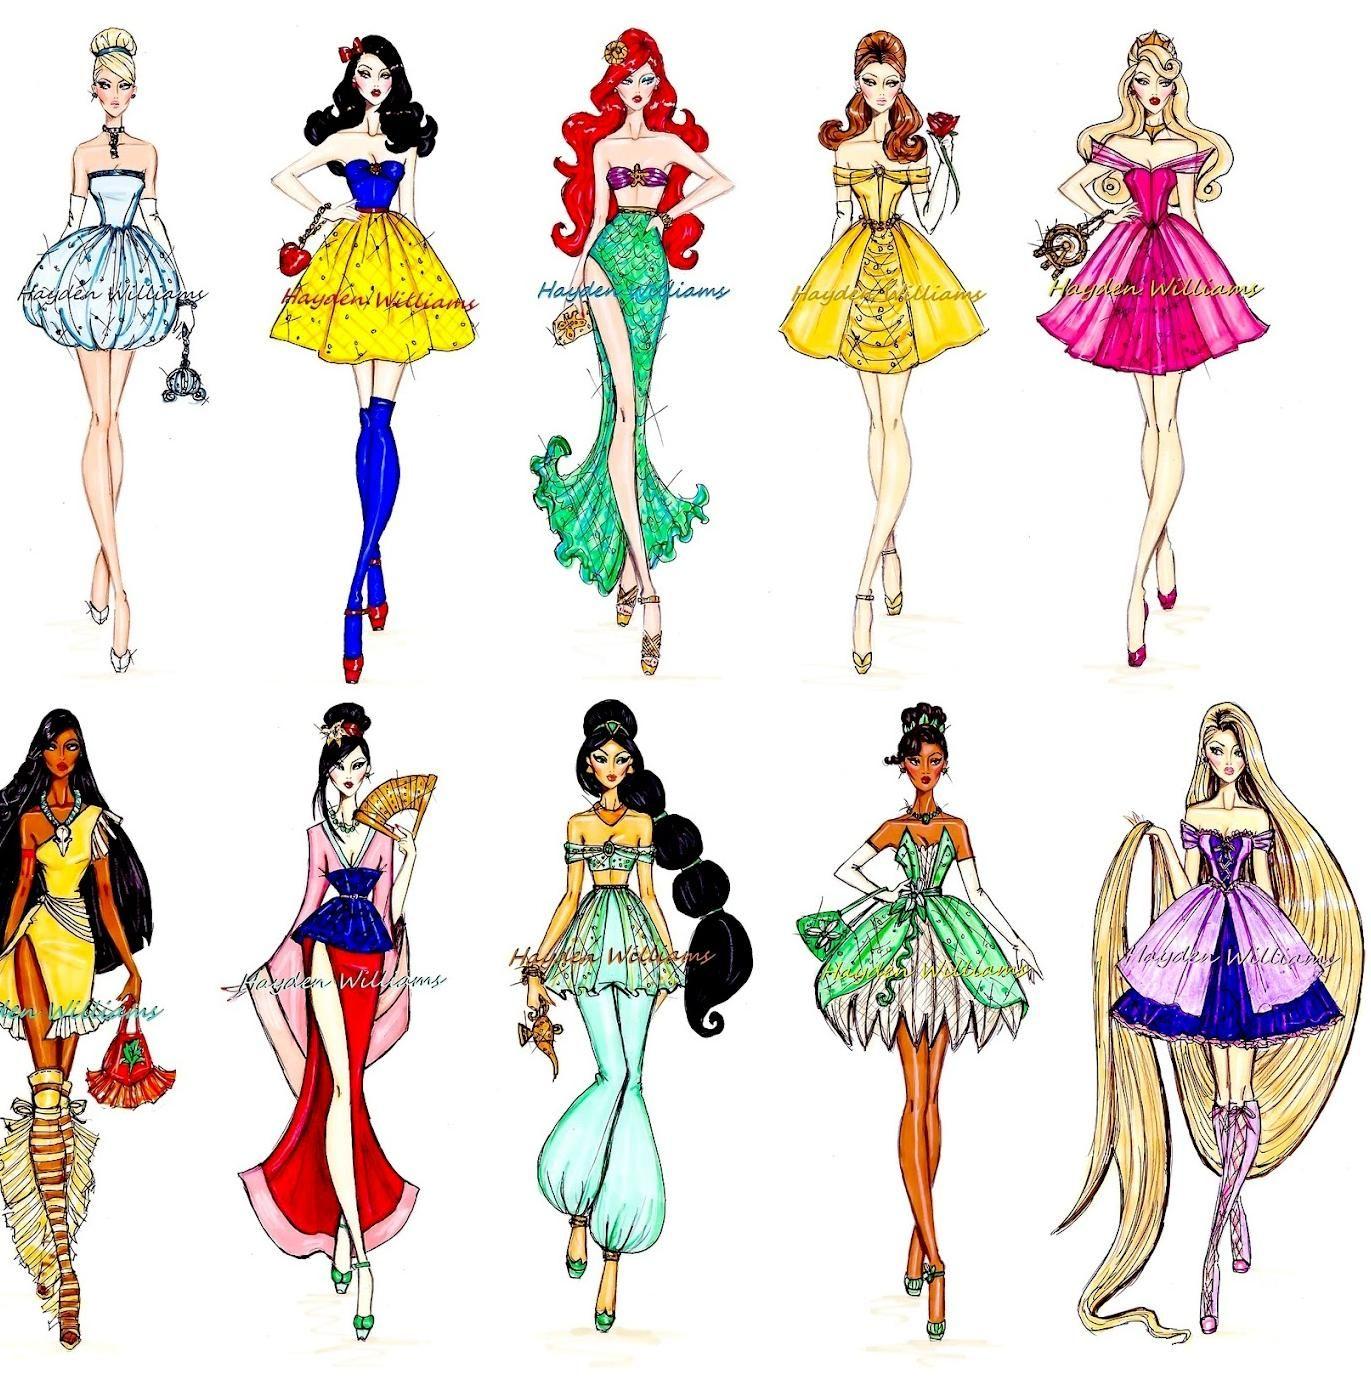 1371x1393 Photos Drawings Of Disney Princesses Tumblr,